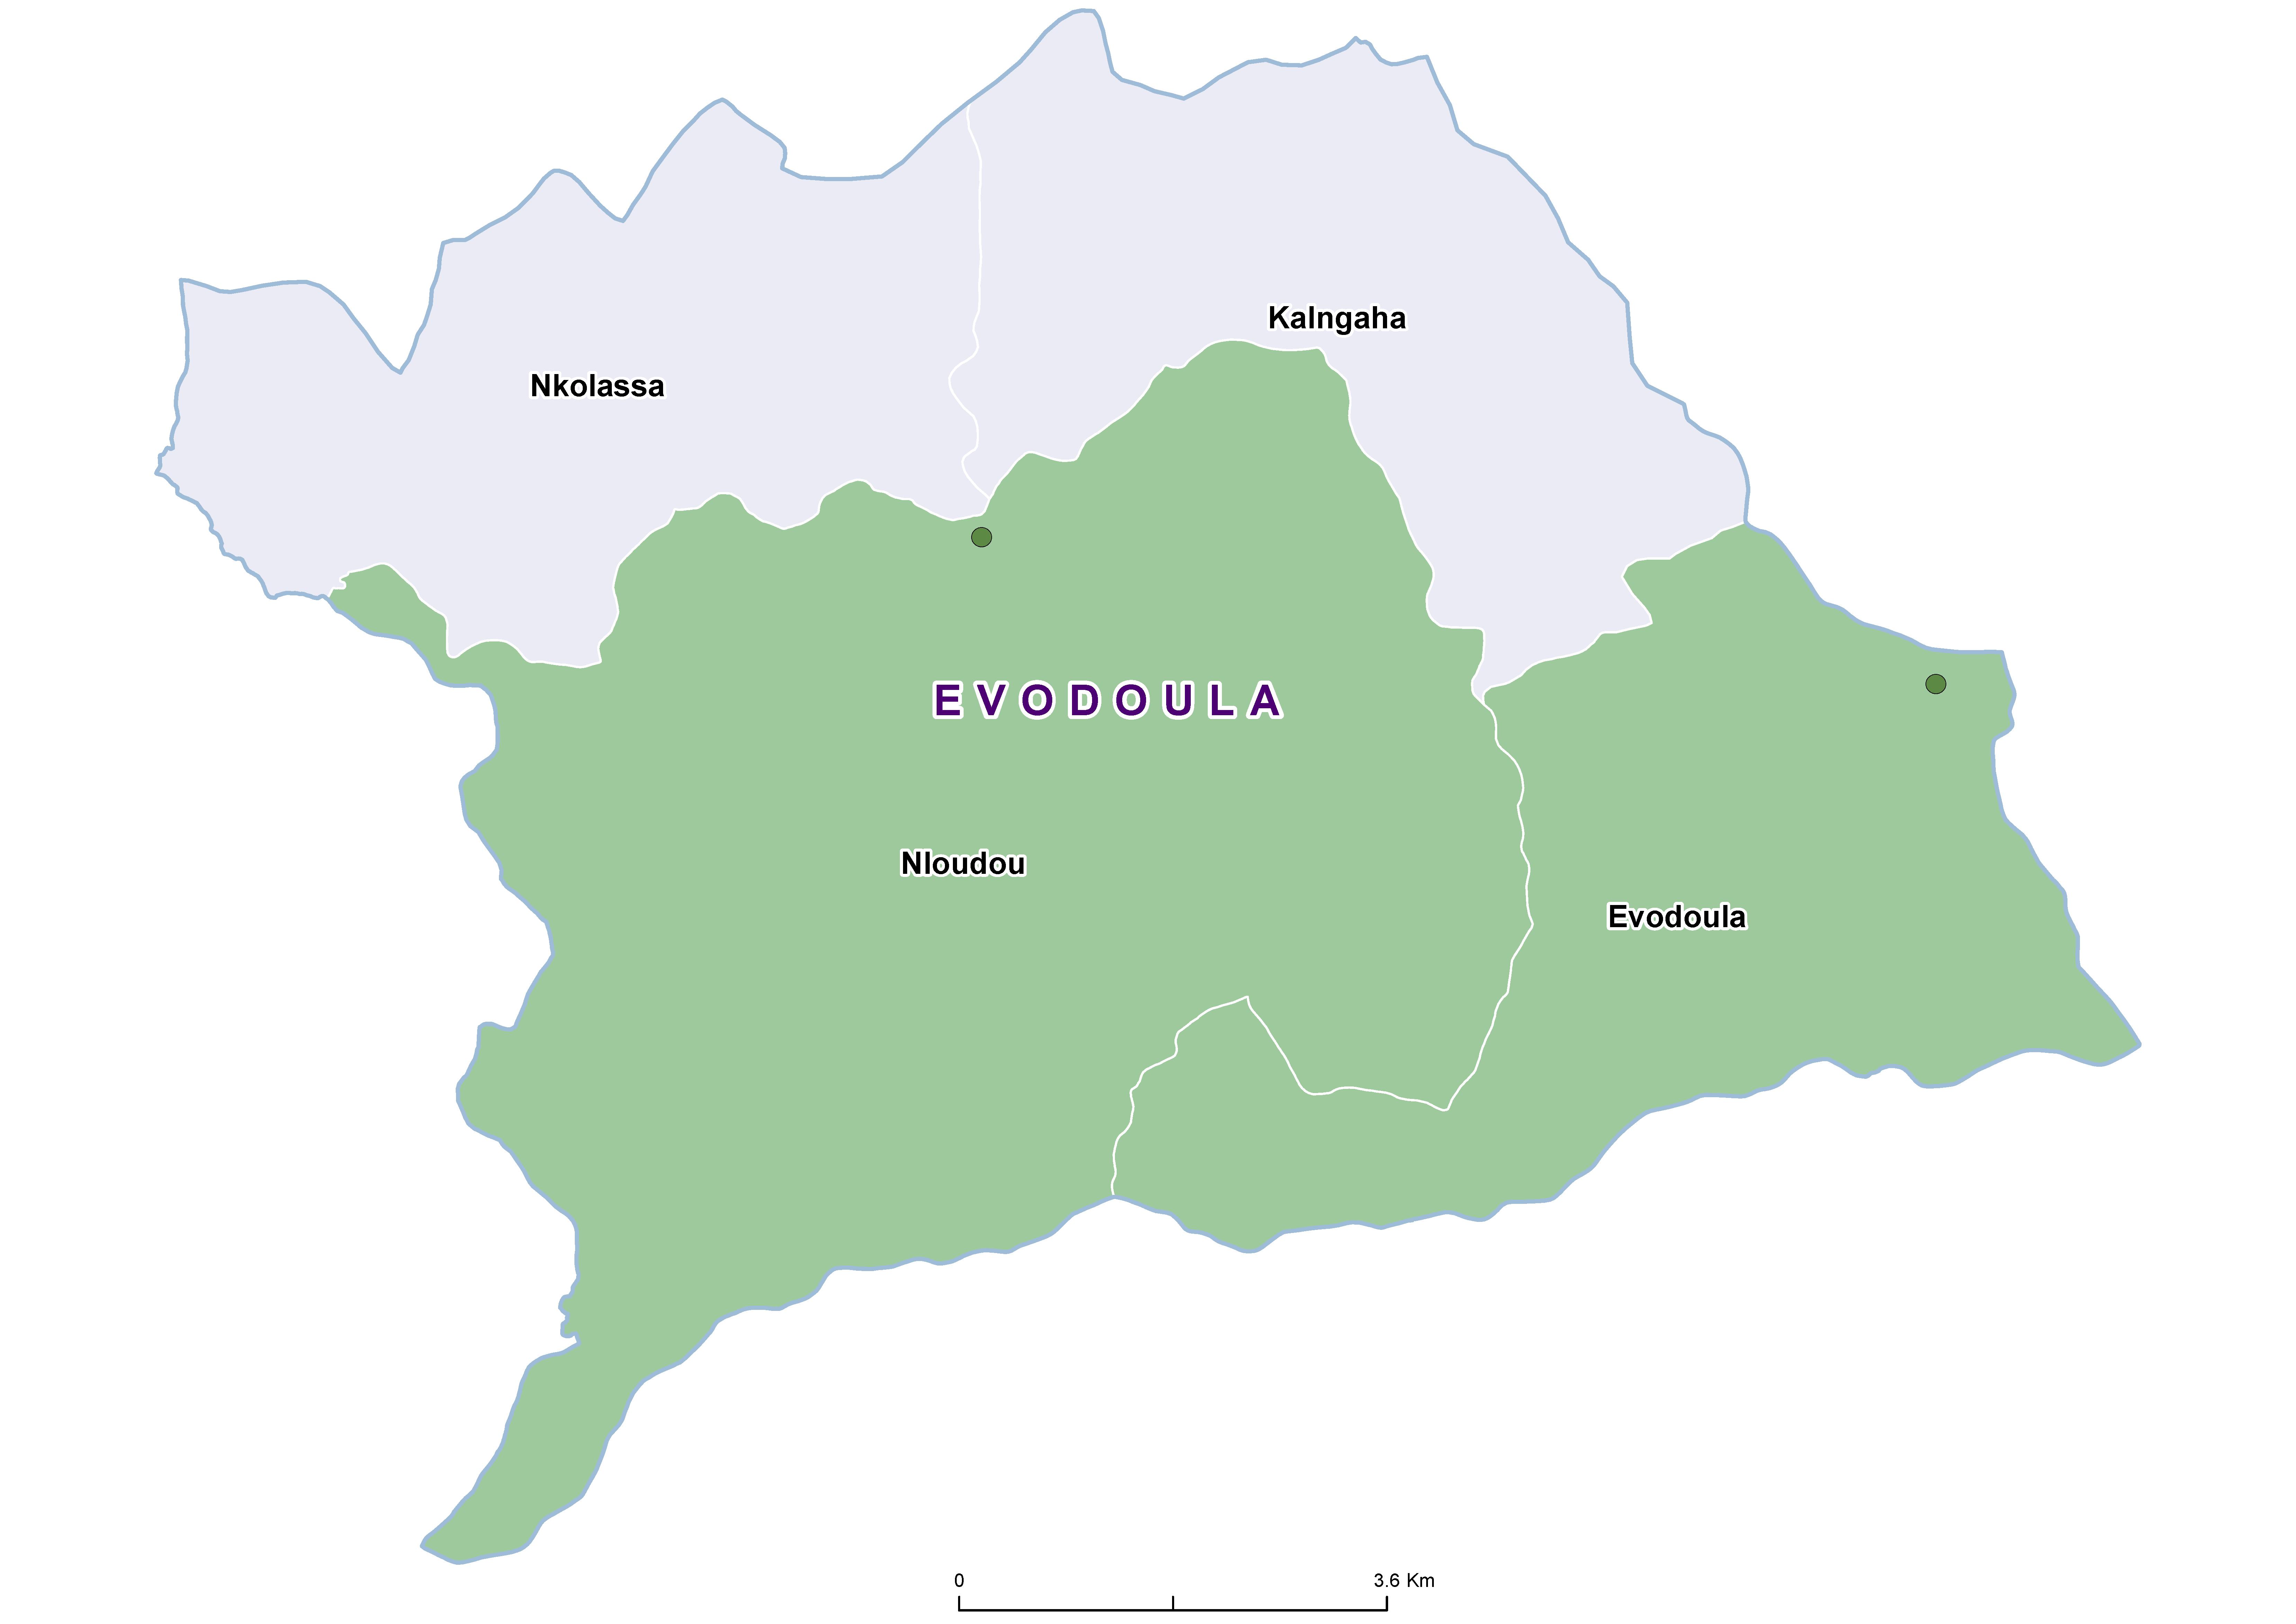 Evodoula SCH 19850001